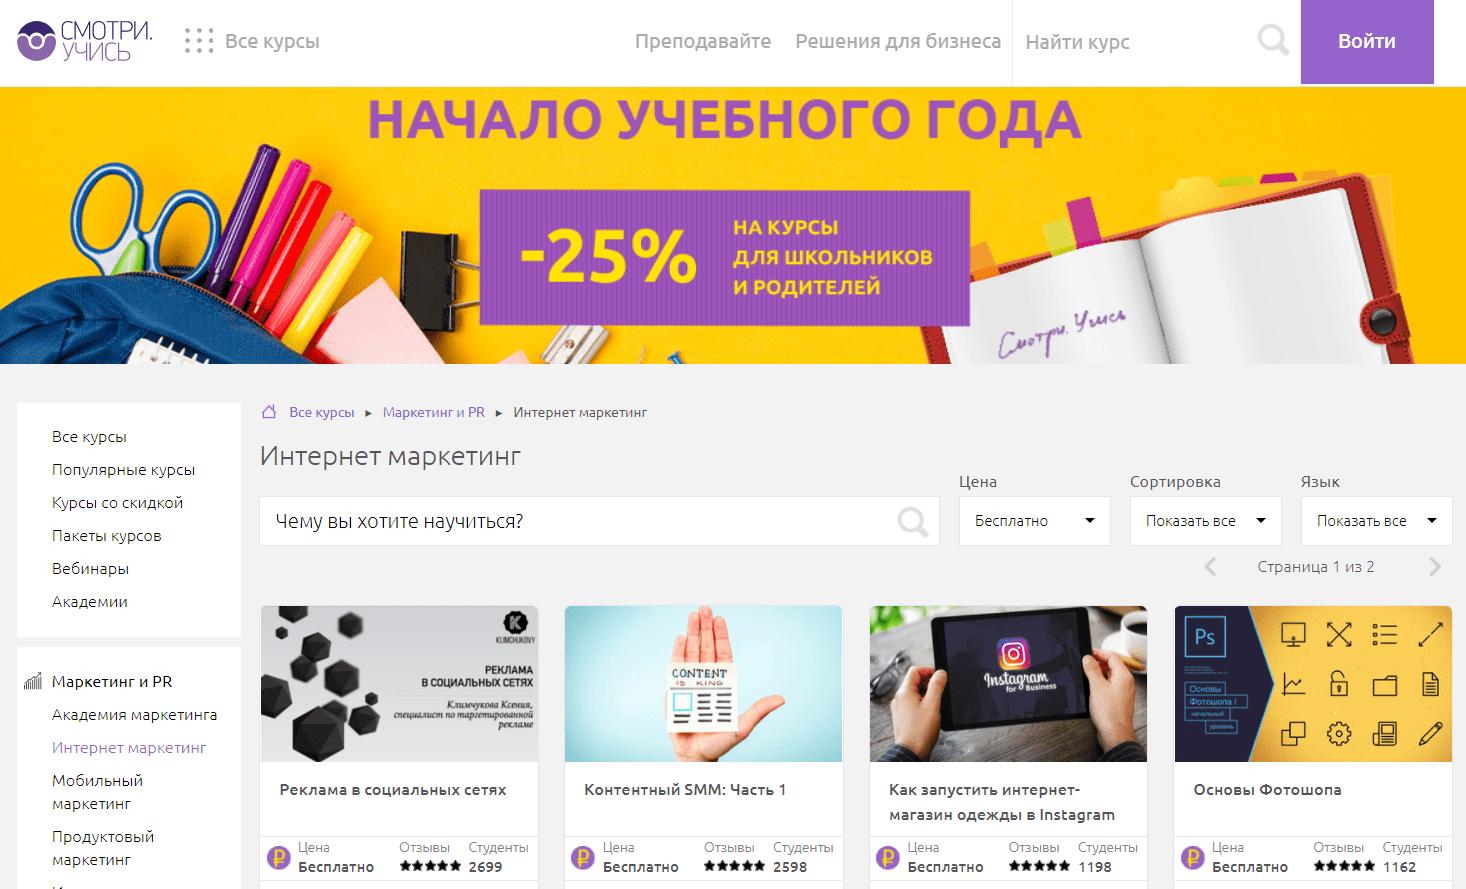 Подборка курсов по интернет-маркетингу